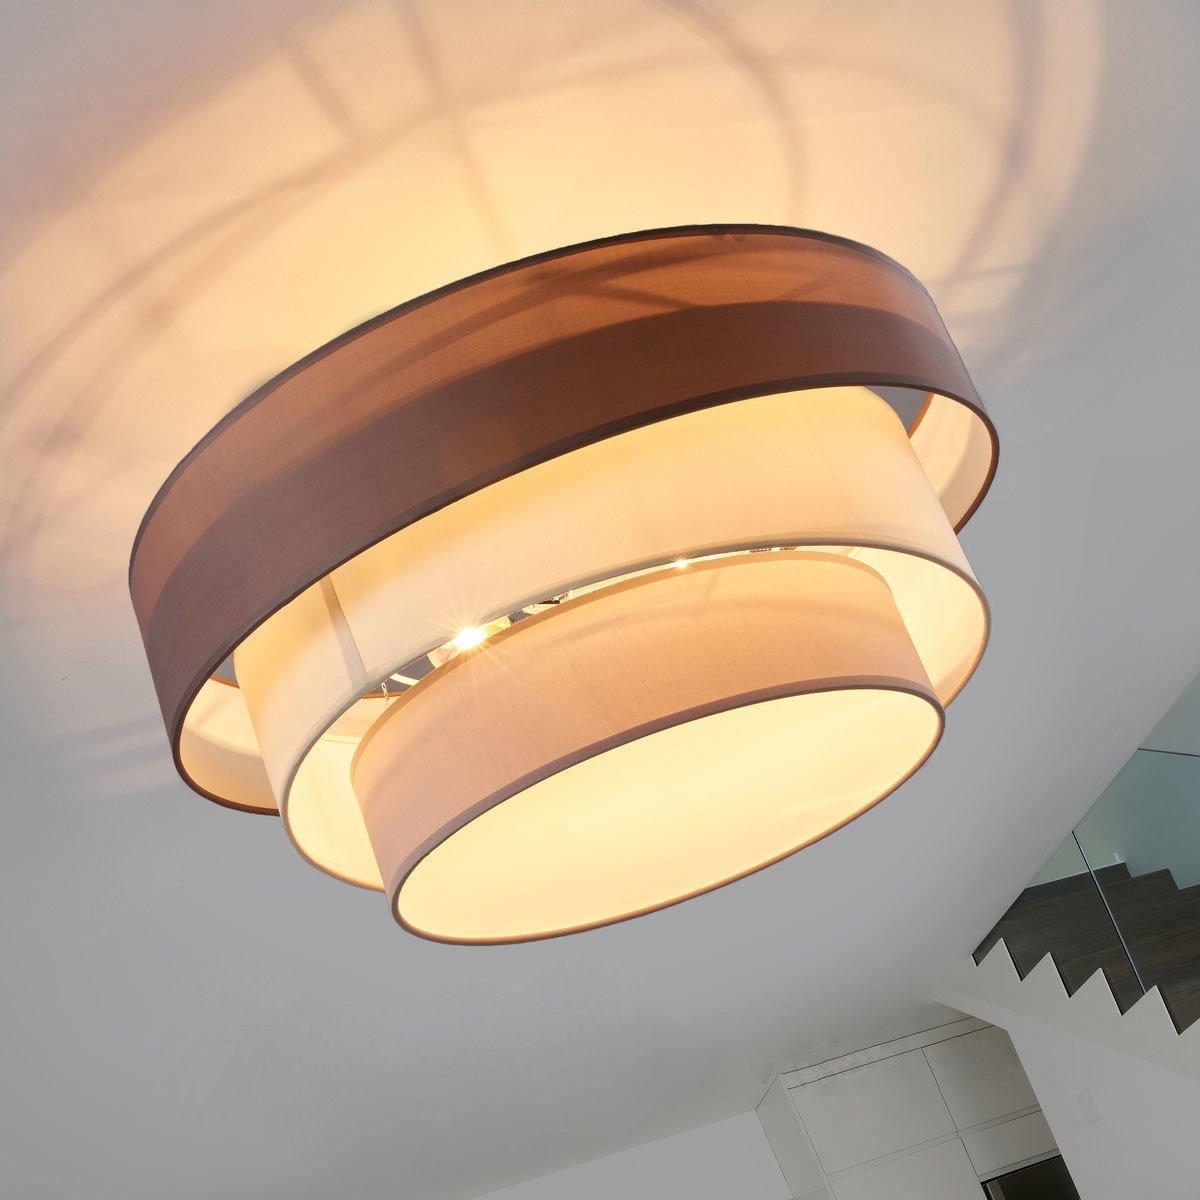 Lampen Schlafzimmer Modern. Schlafzimmer Himmelbett Wand